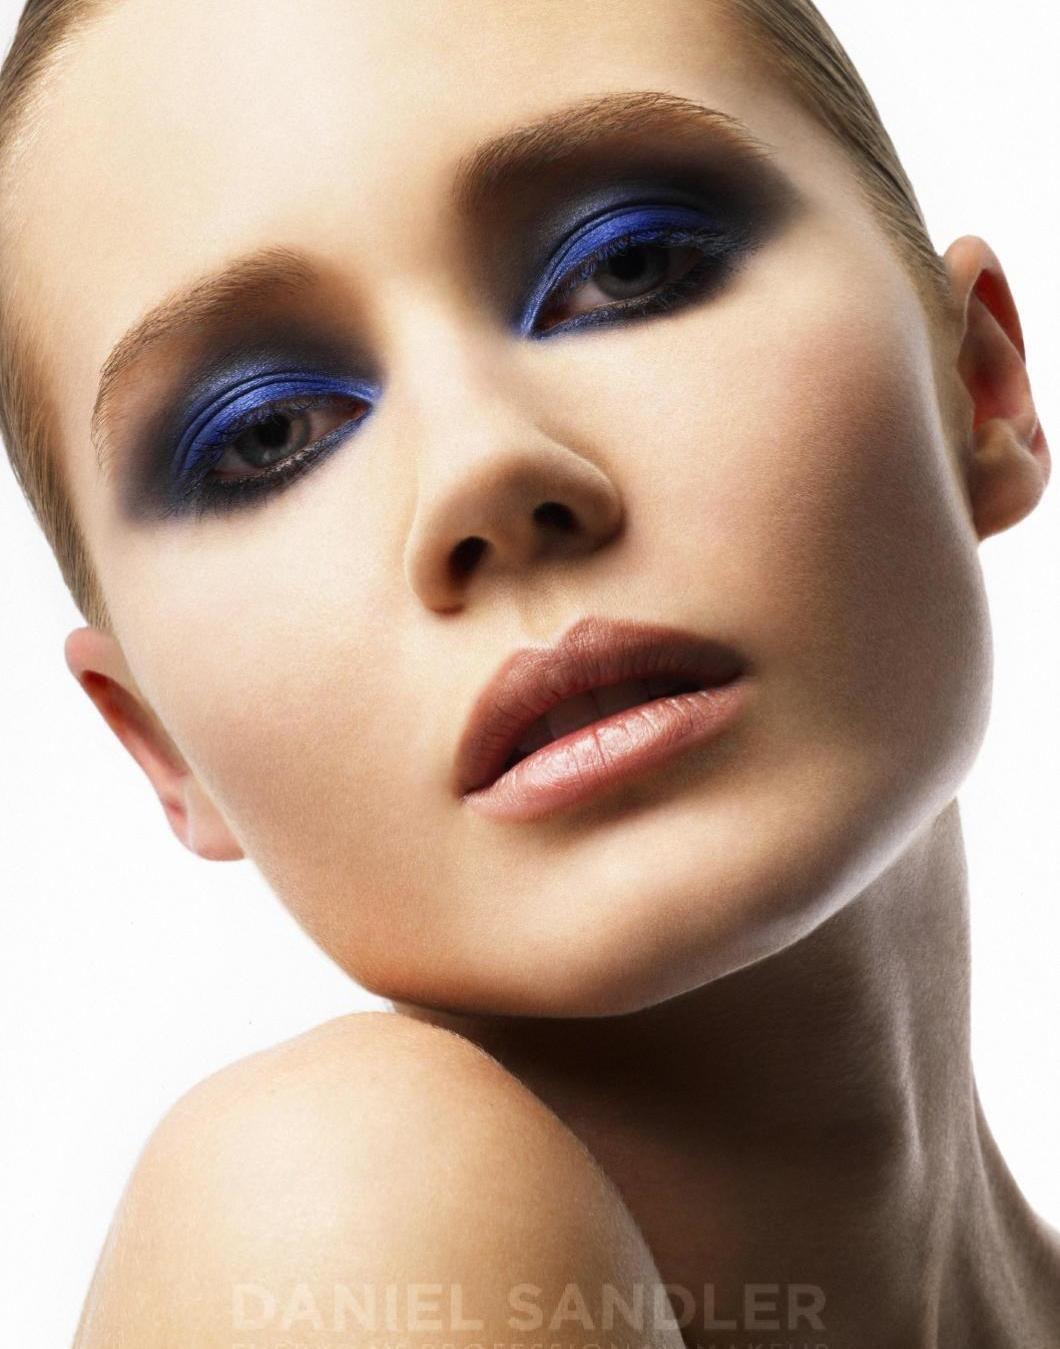 haute couture makeup | MakeUp4All